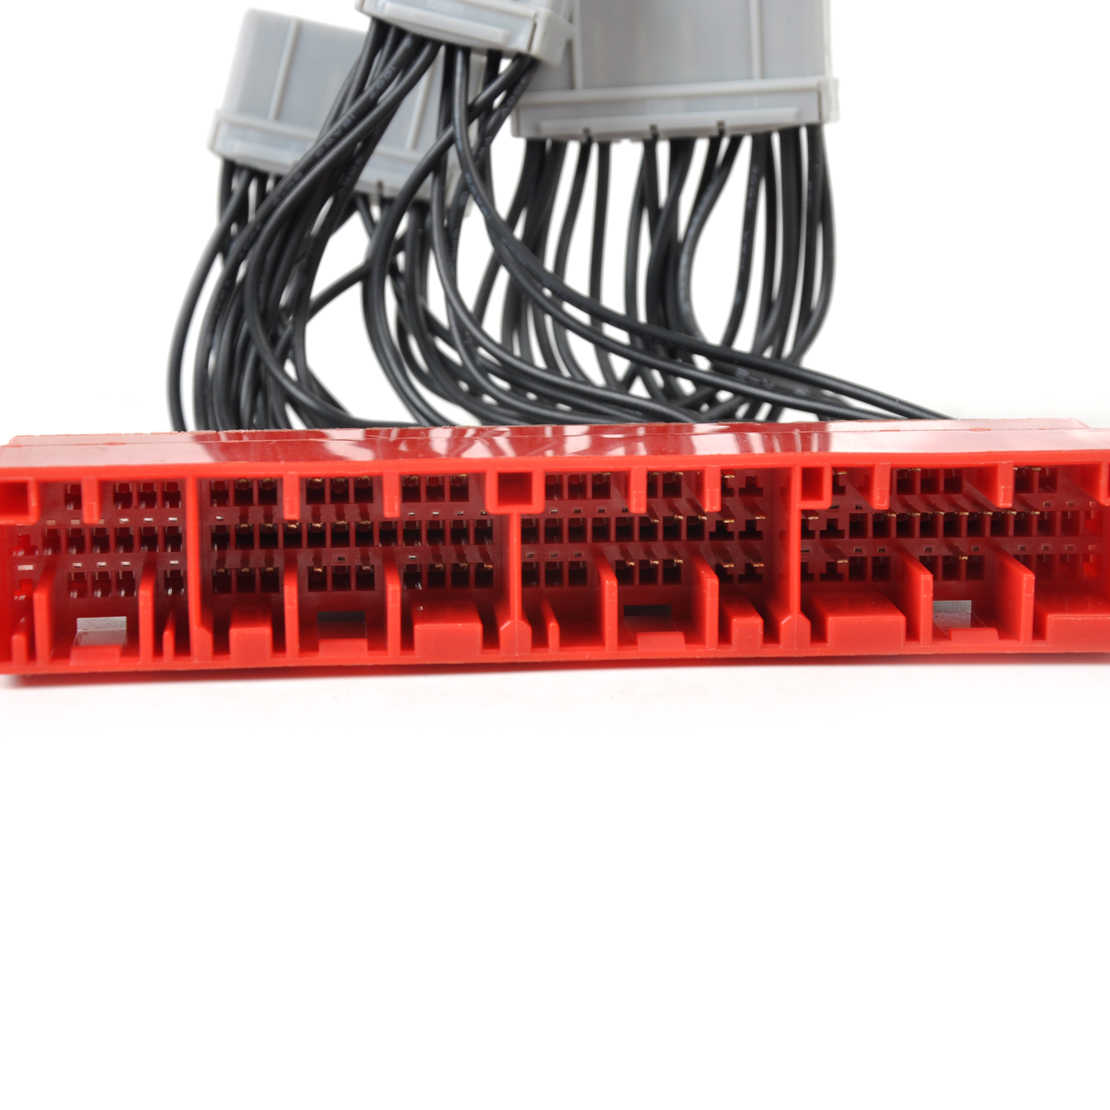 small resolution of  citall obd2b to obd1 conversion ecu harness jumper adapter wire for honda civic accord acura integra